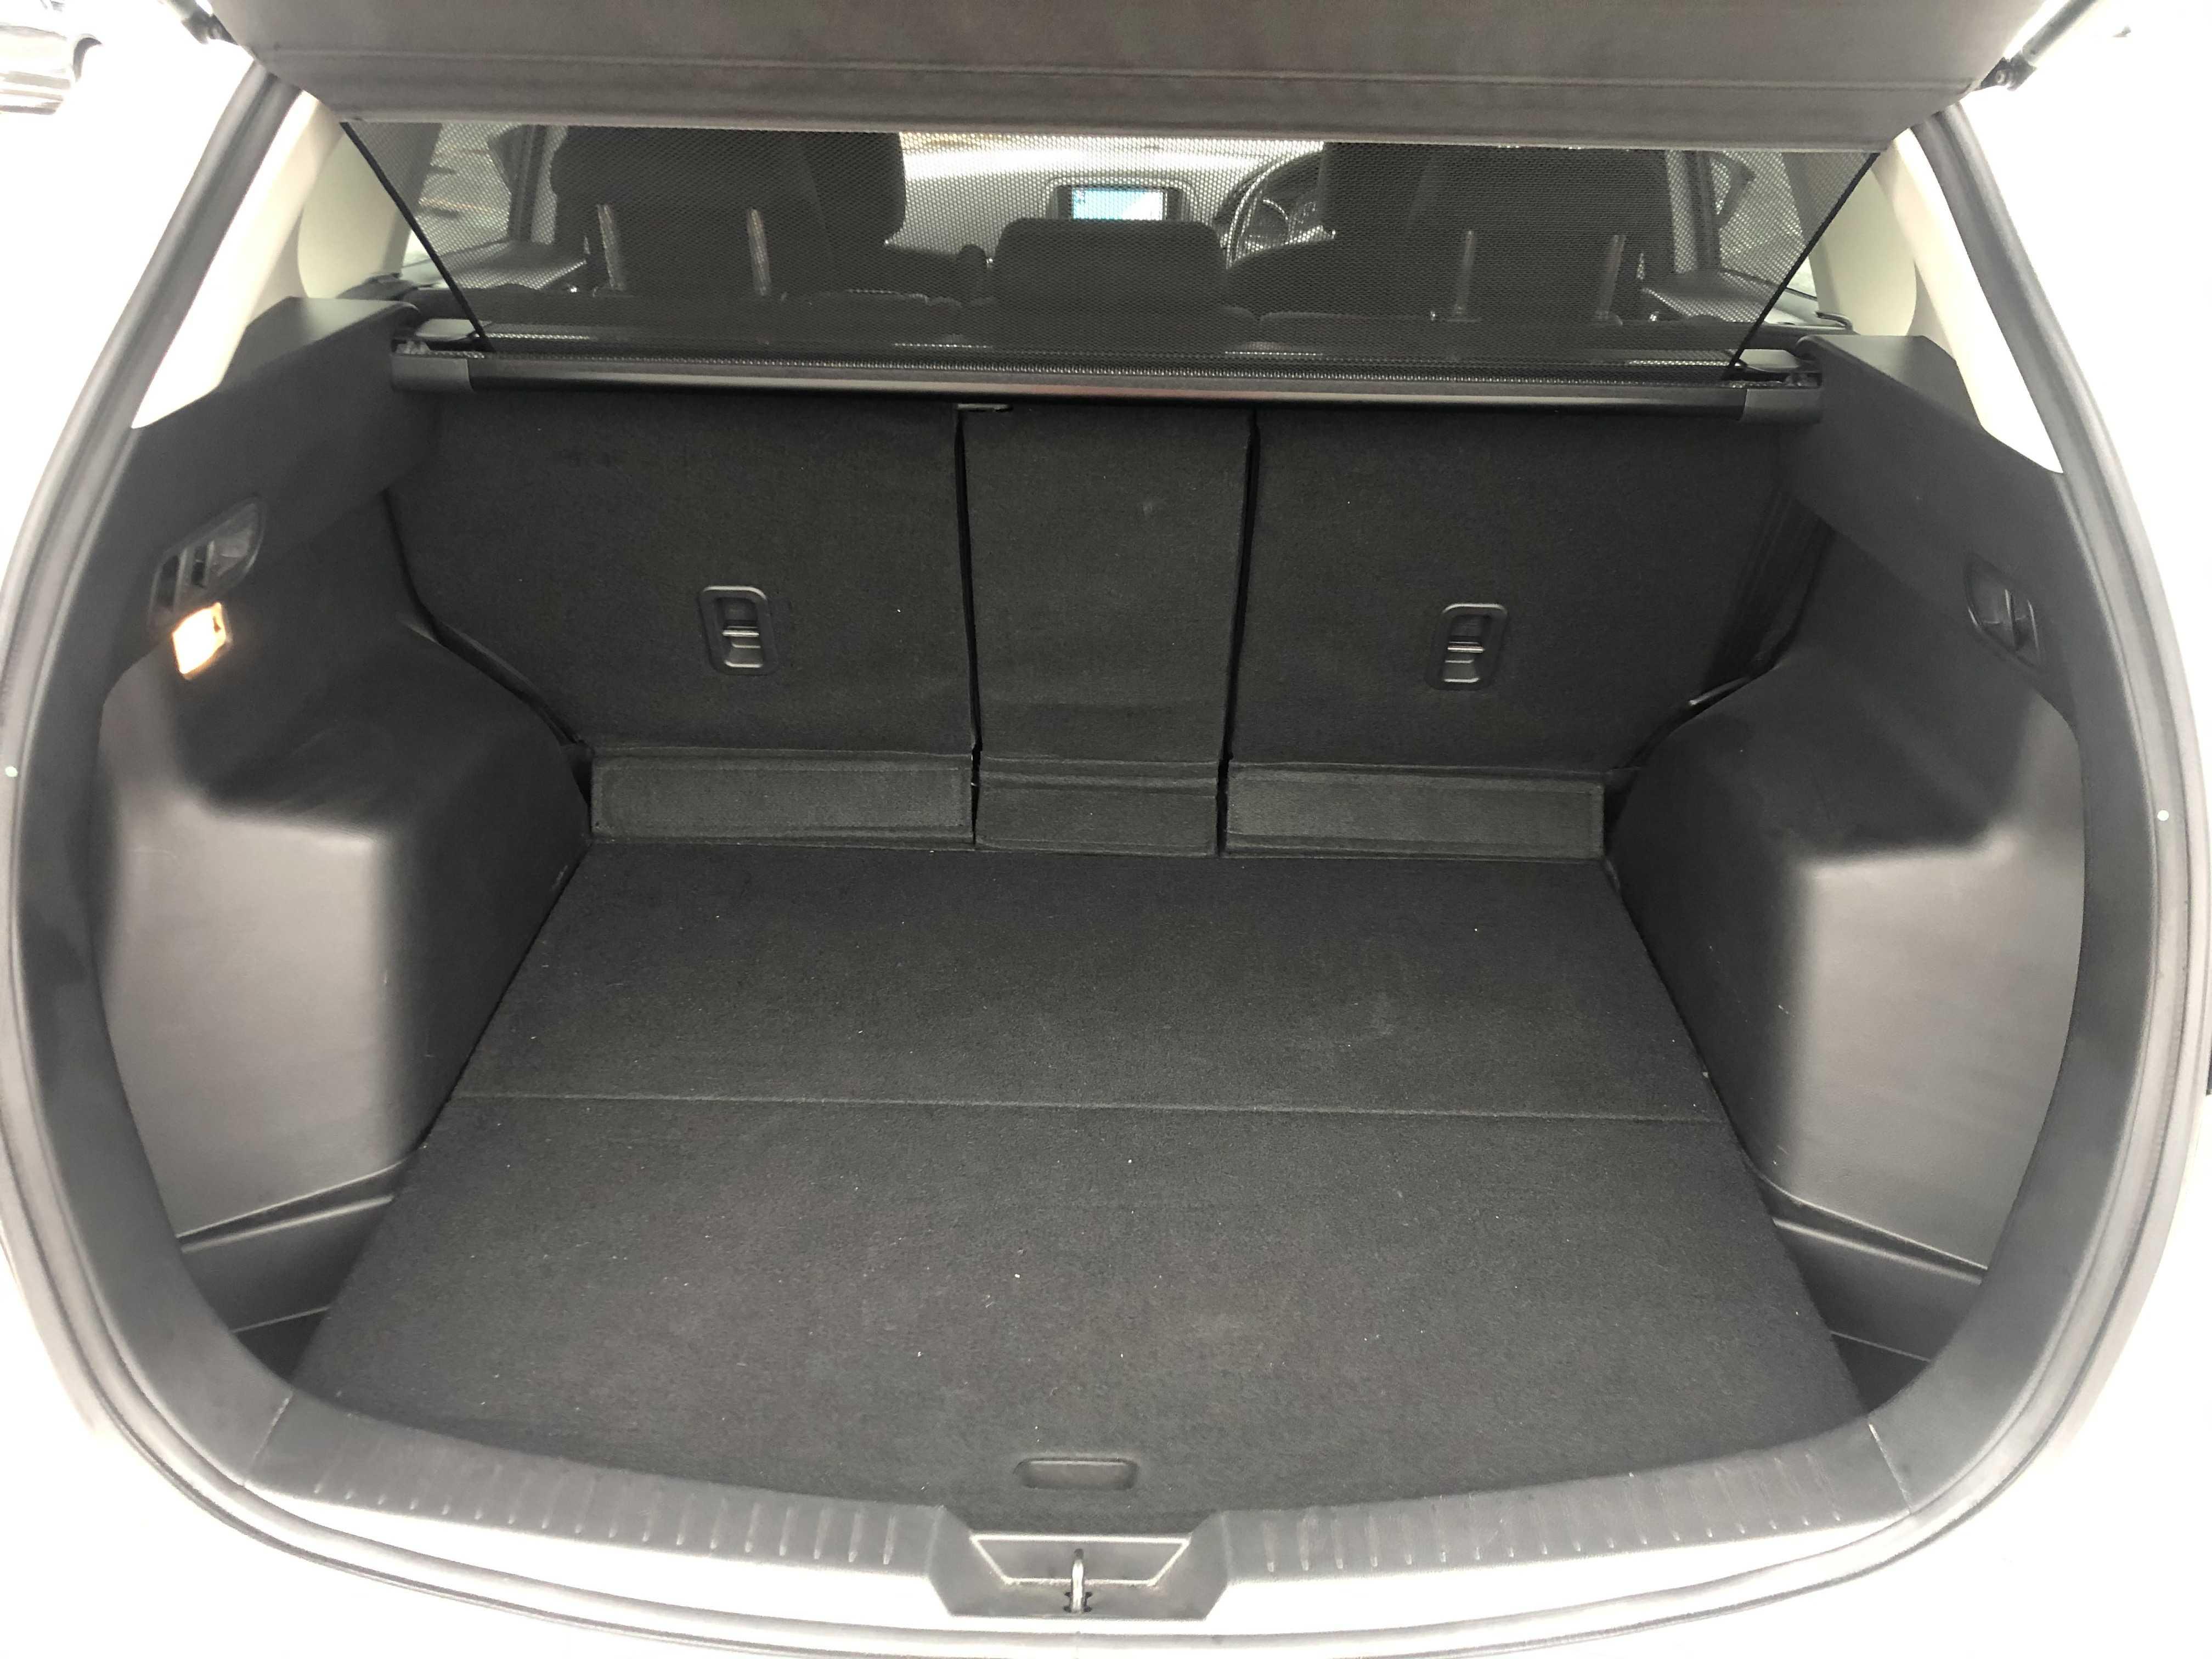 Mazda CX-5 2012, PEARL, 2200cc, ATM - Autocraft Japan